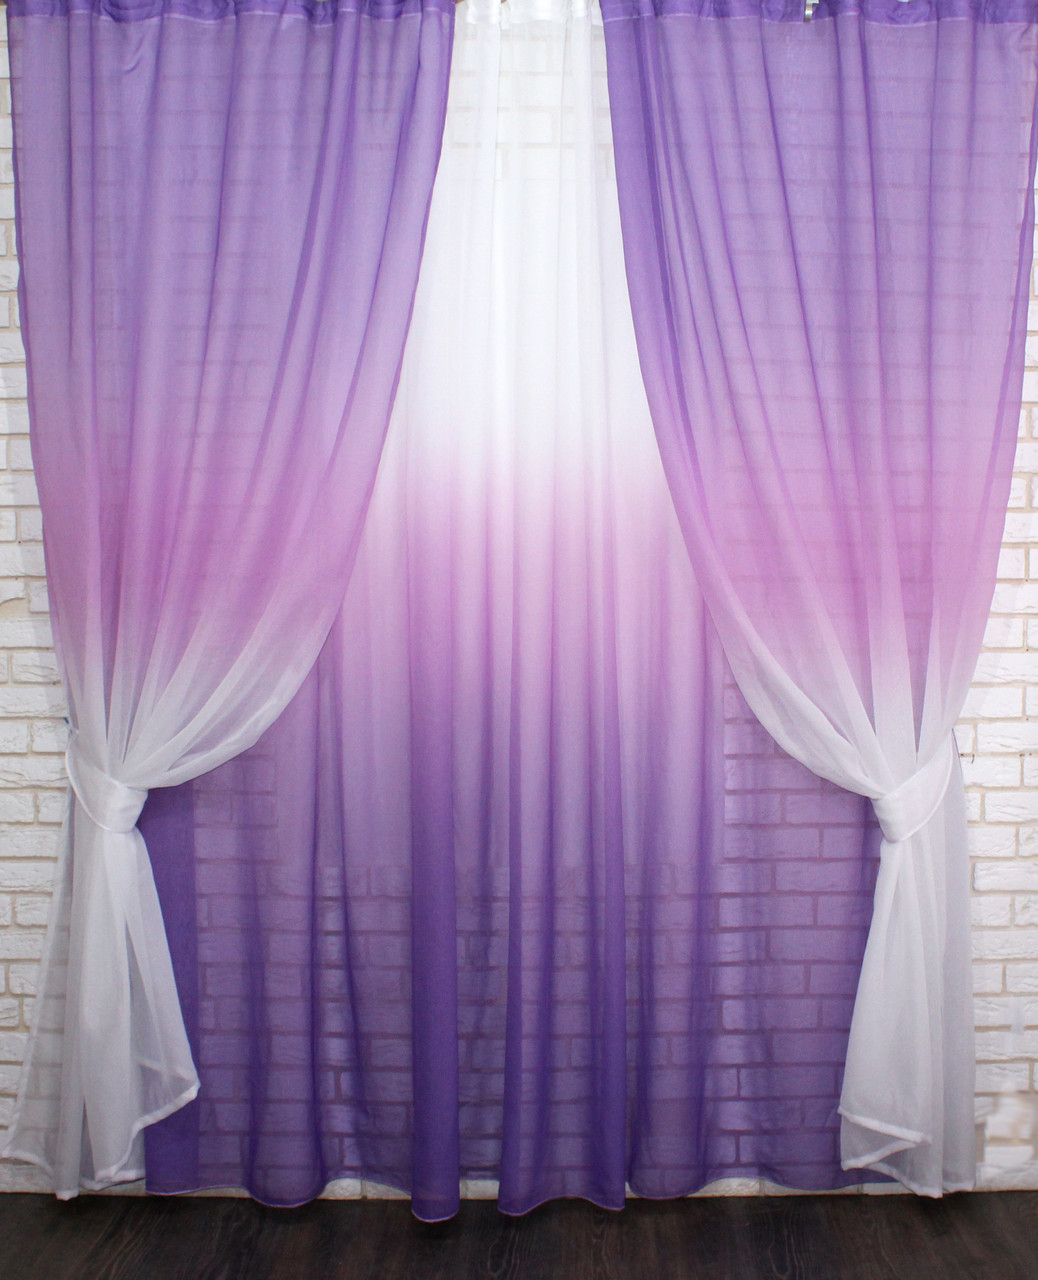 "Комплект растяжка ""Омбре"", ткань батист, под лён. (4х2,5м.+ 2шт.1,5x2,5мЦвет фиолетовый 031дк518 10-112"